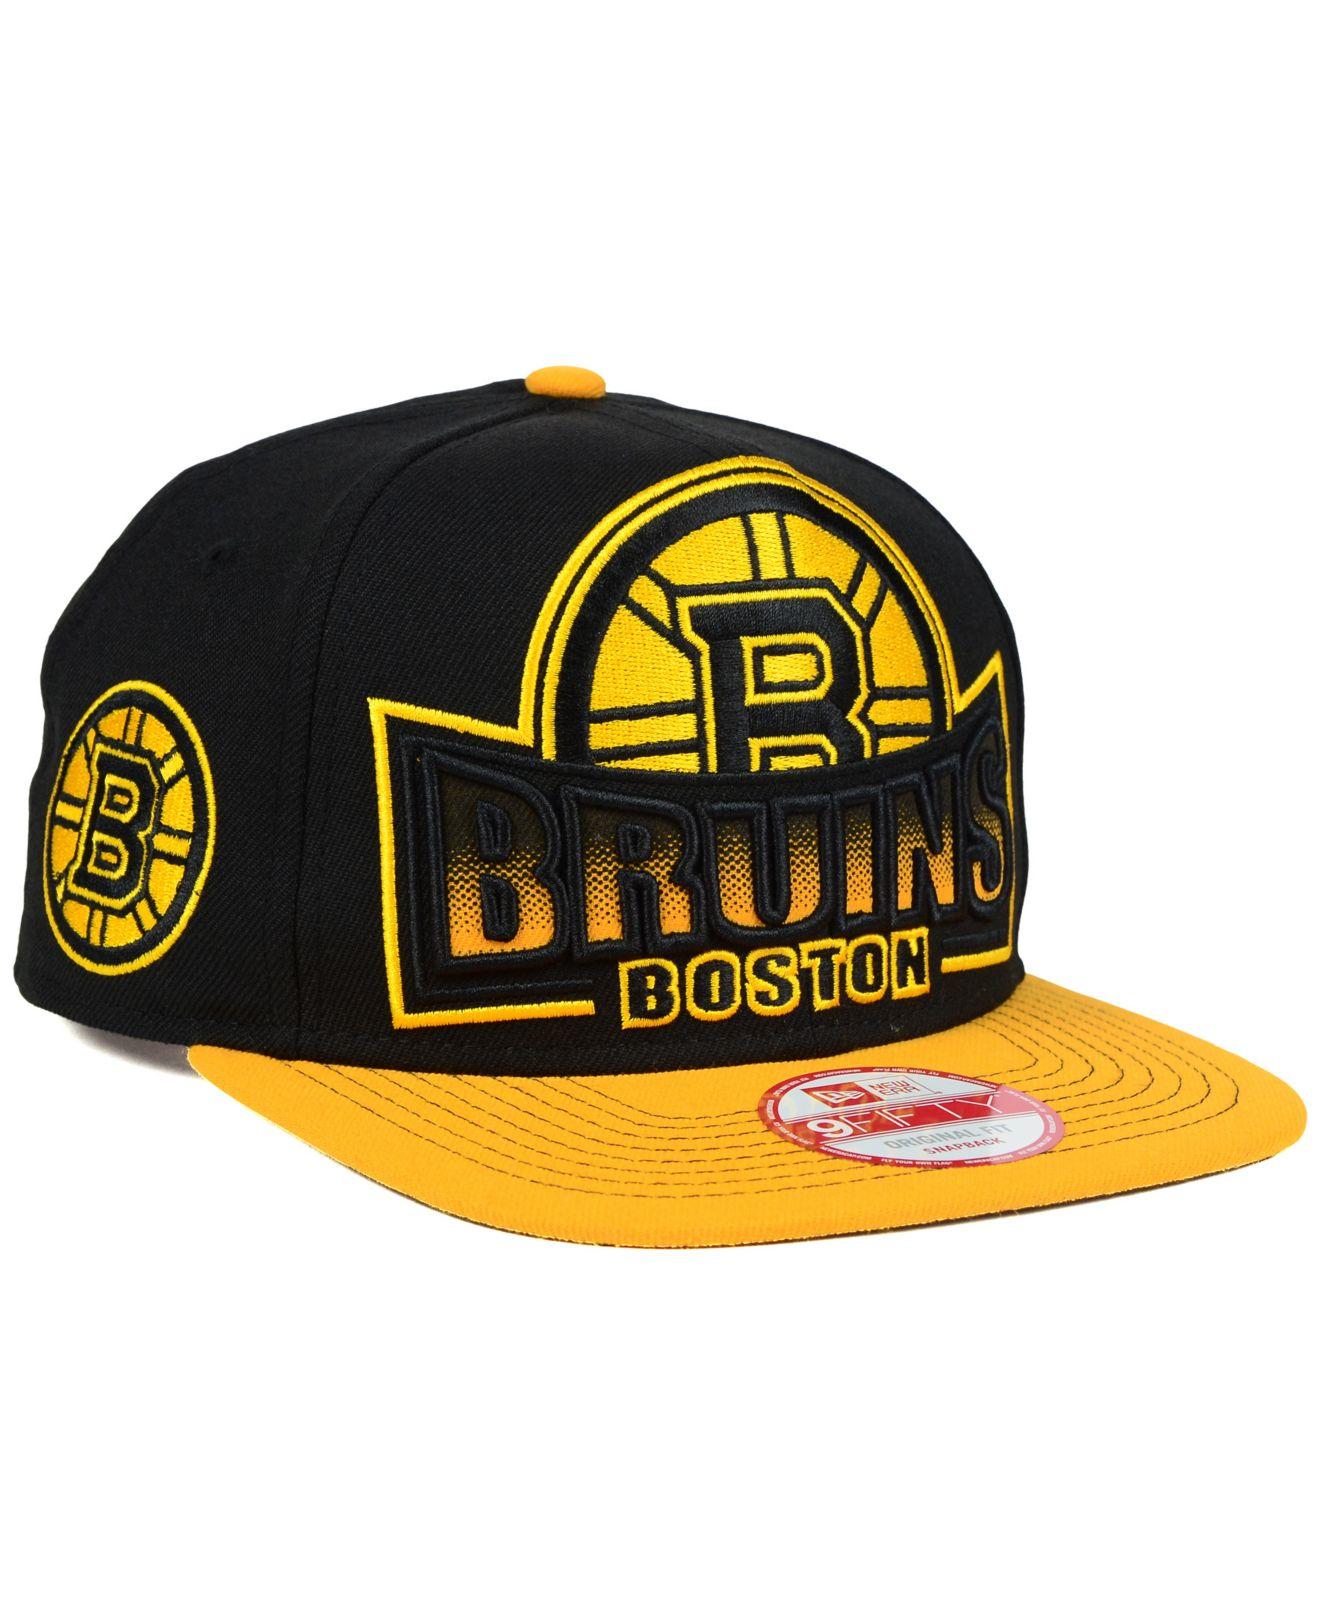 d331120ac36 Lyst - Ktz Boston Bruins Grader 9fifty Snapback Cap in Black for Men